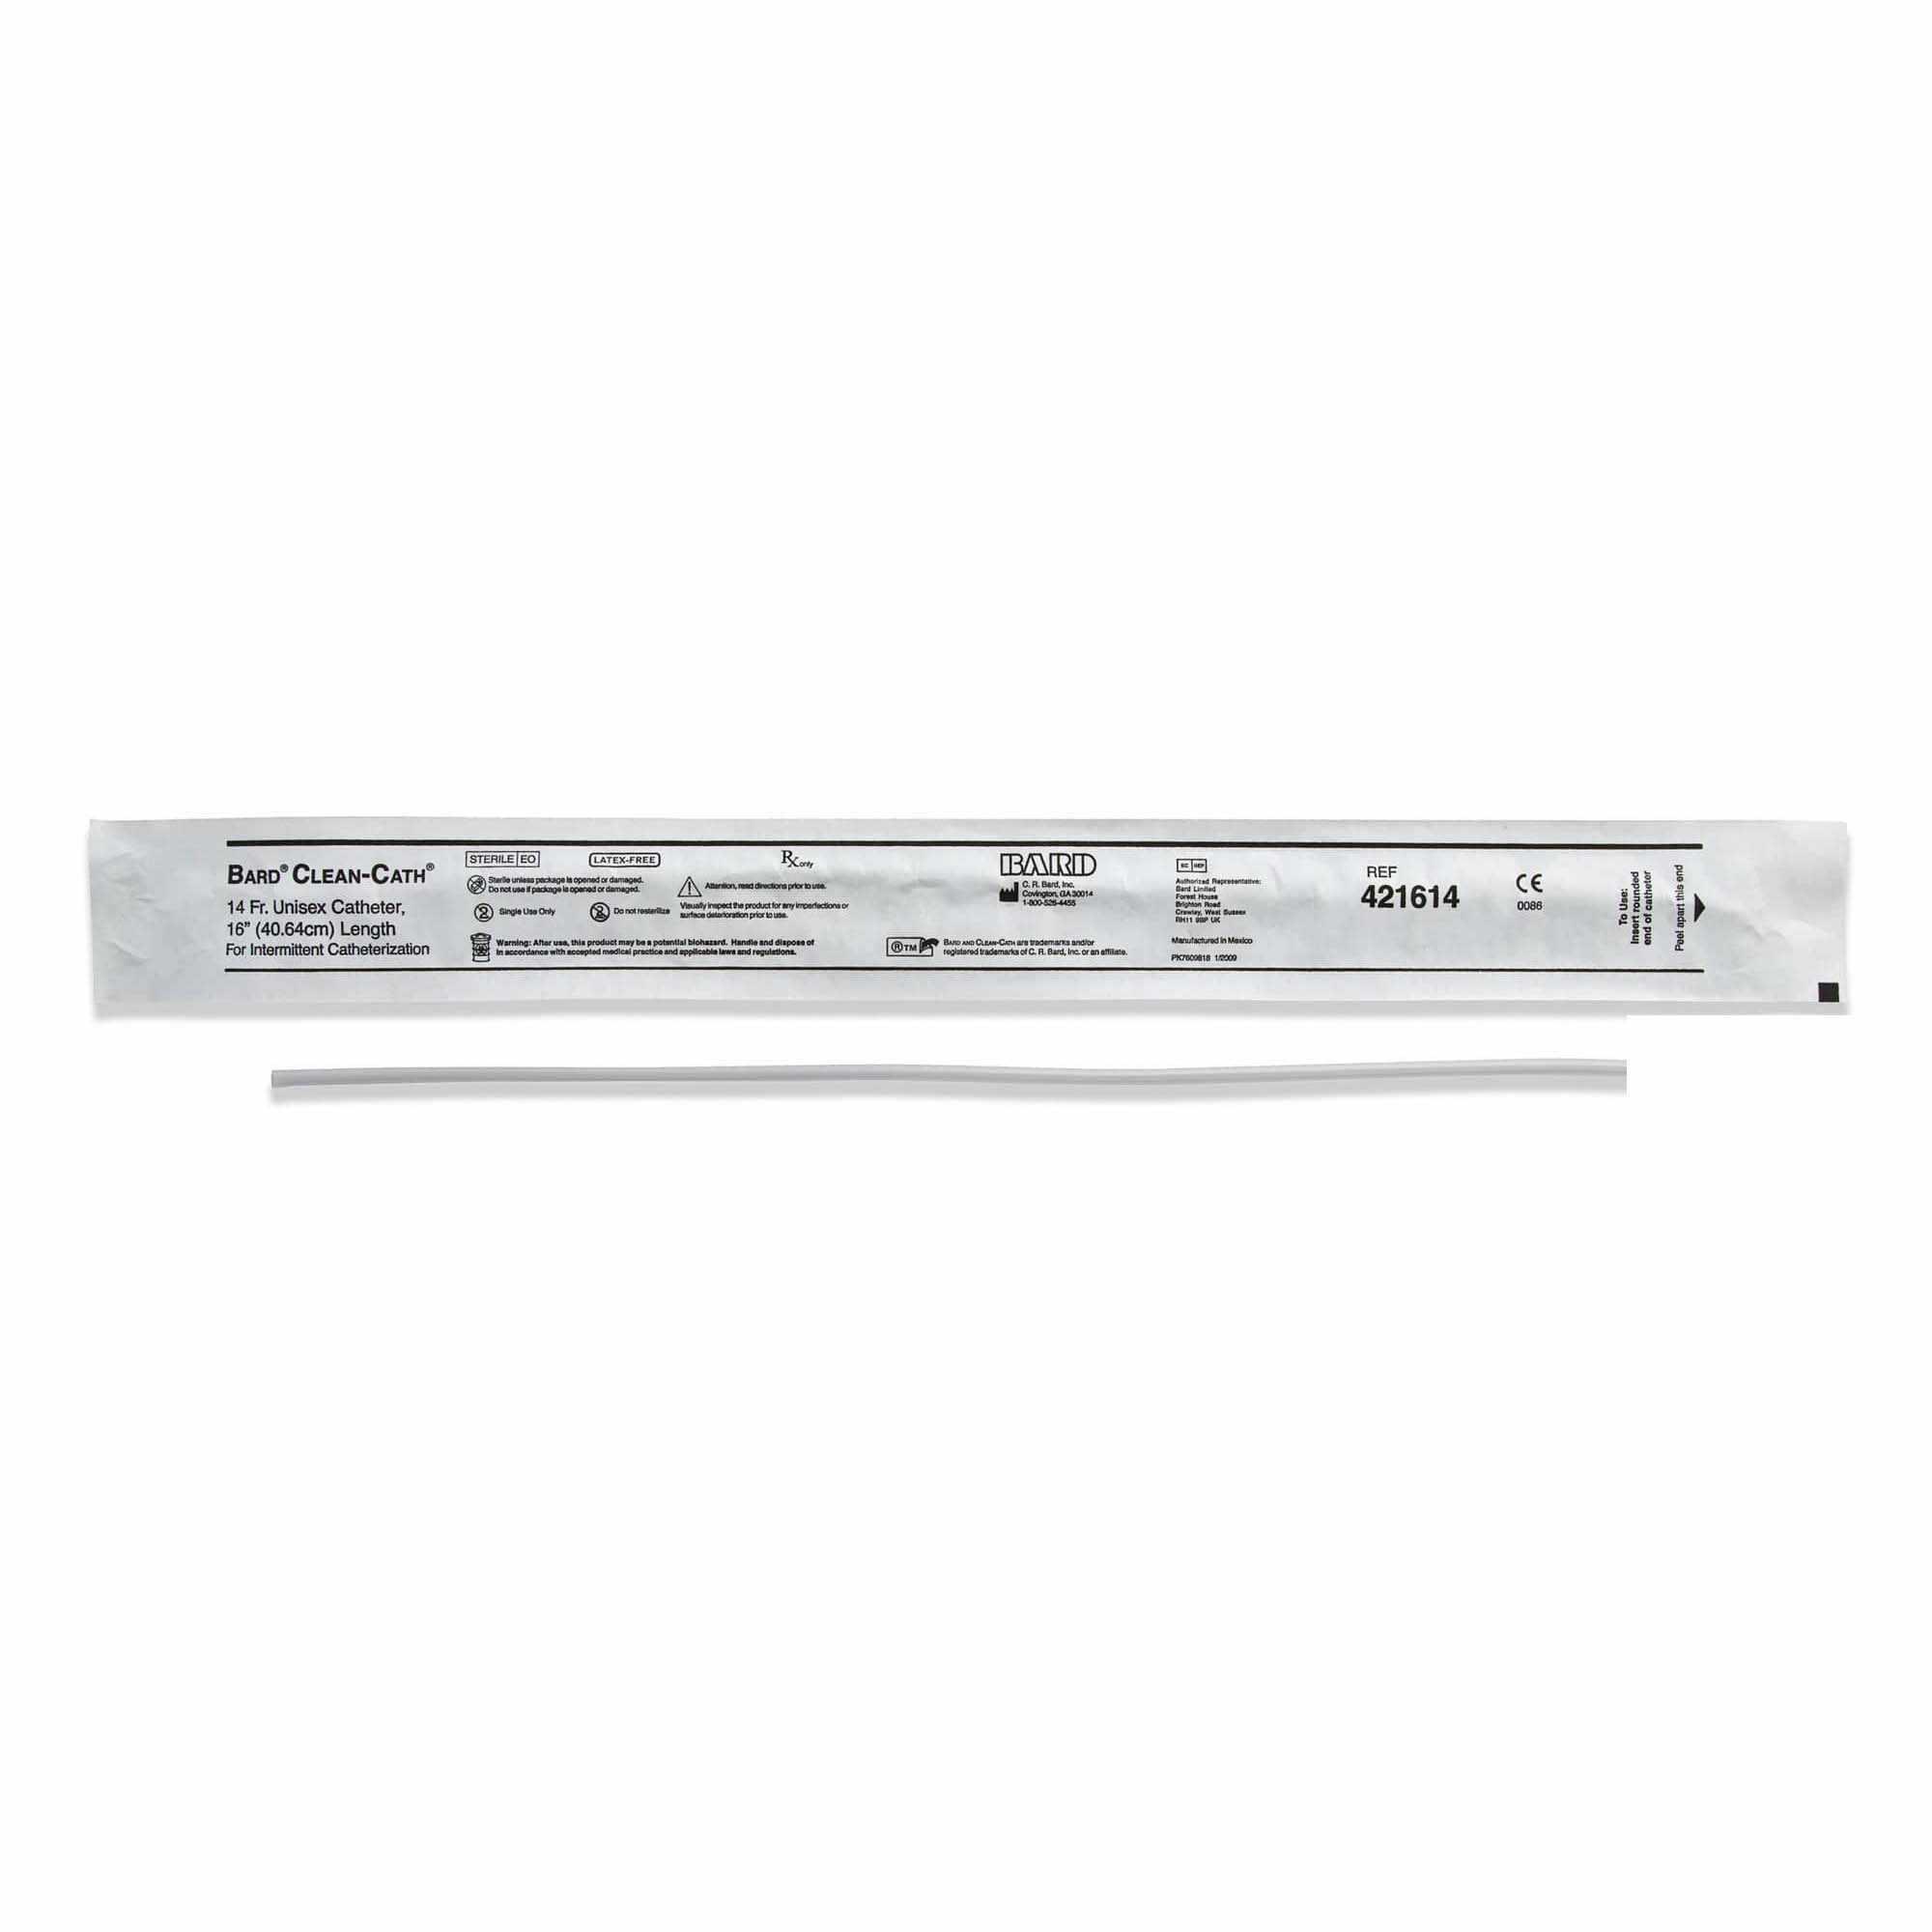 "Bard Clean-Cath Vinyl Unisex Catheter, 14Fr, 16"" L"